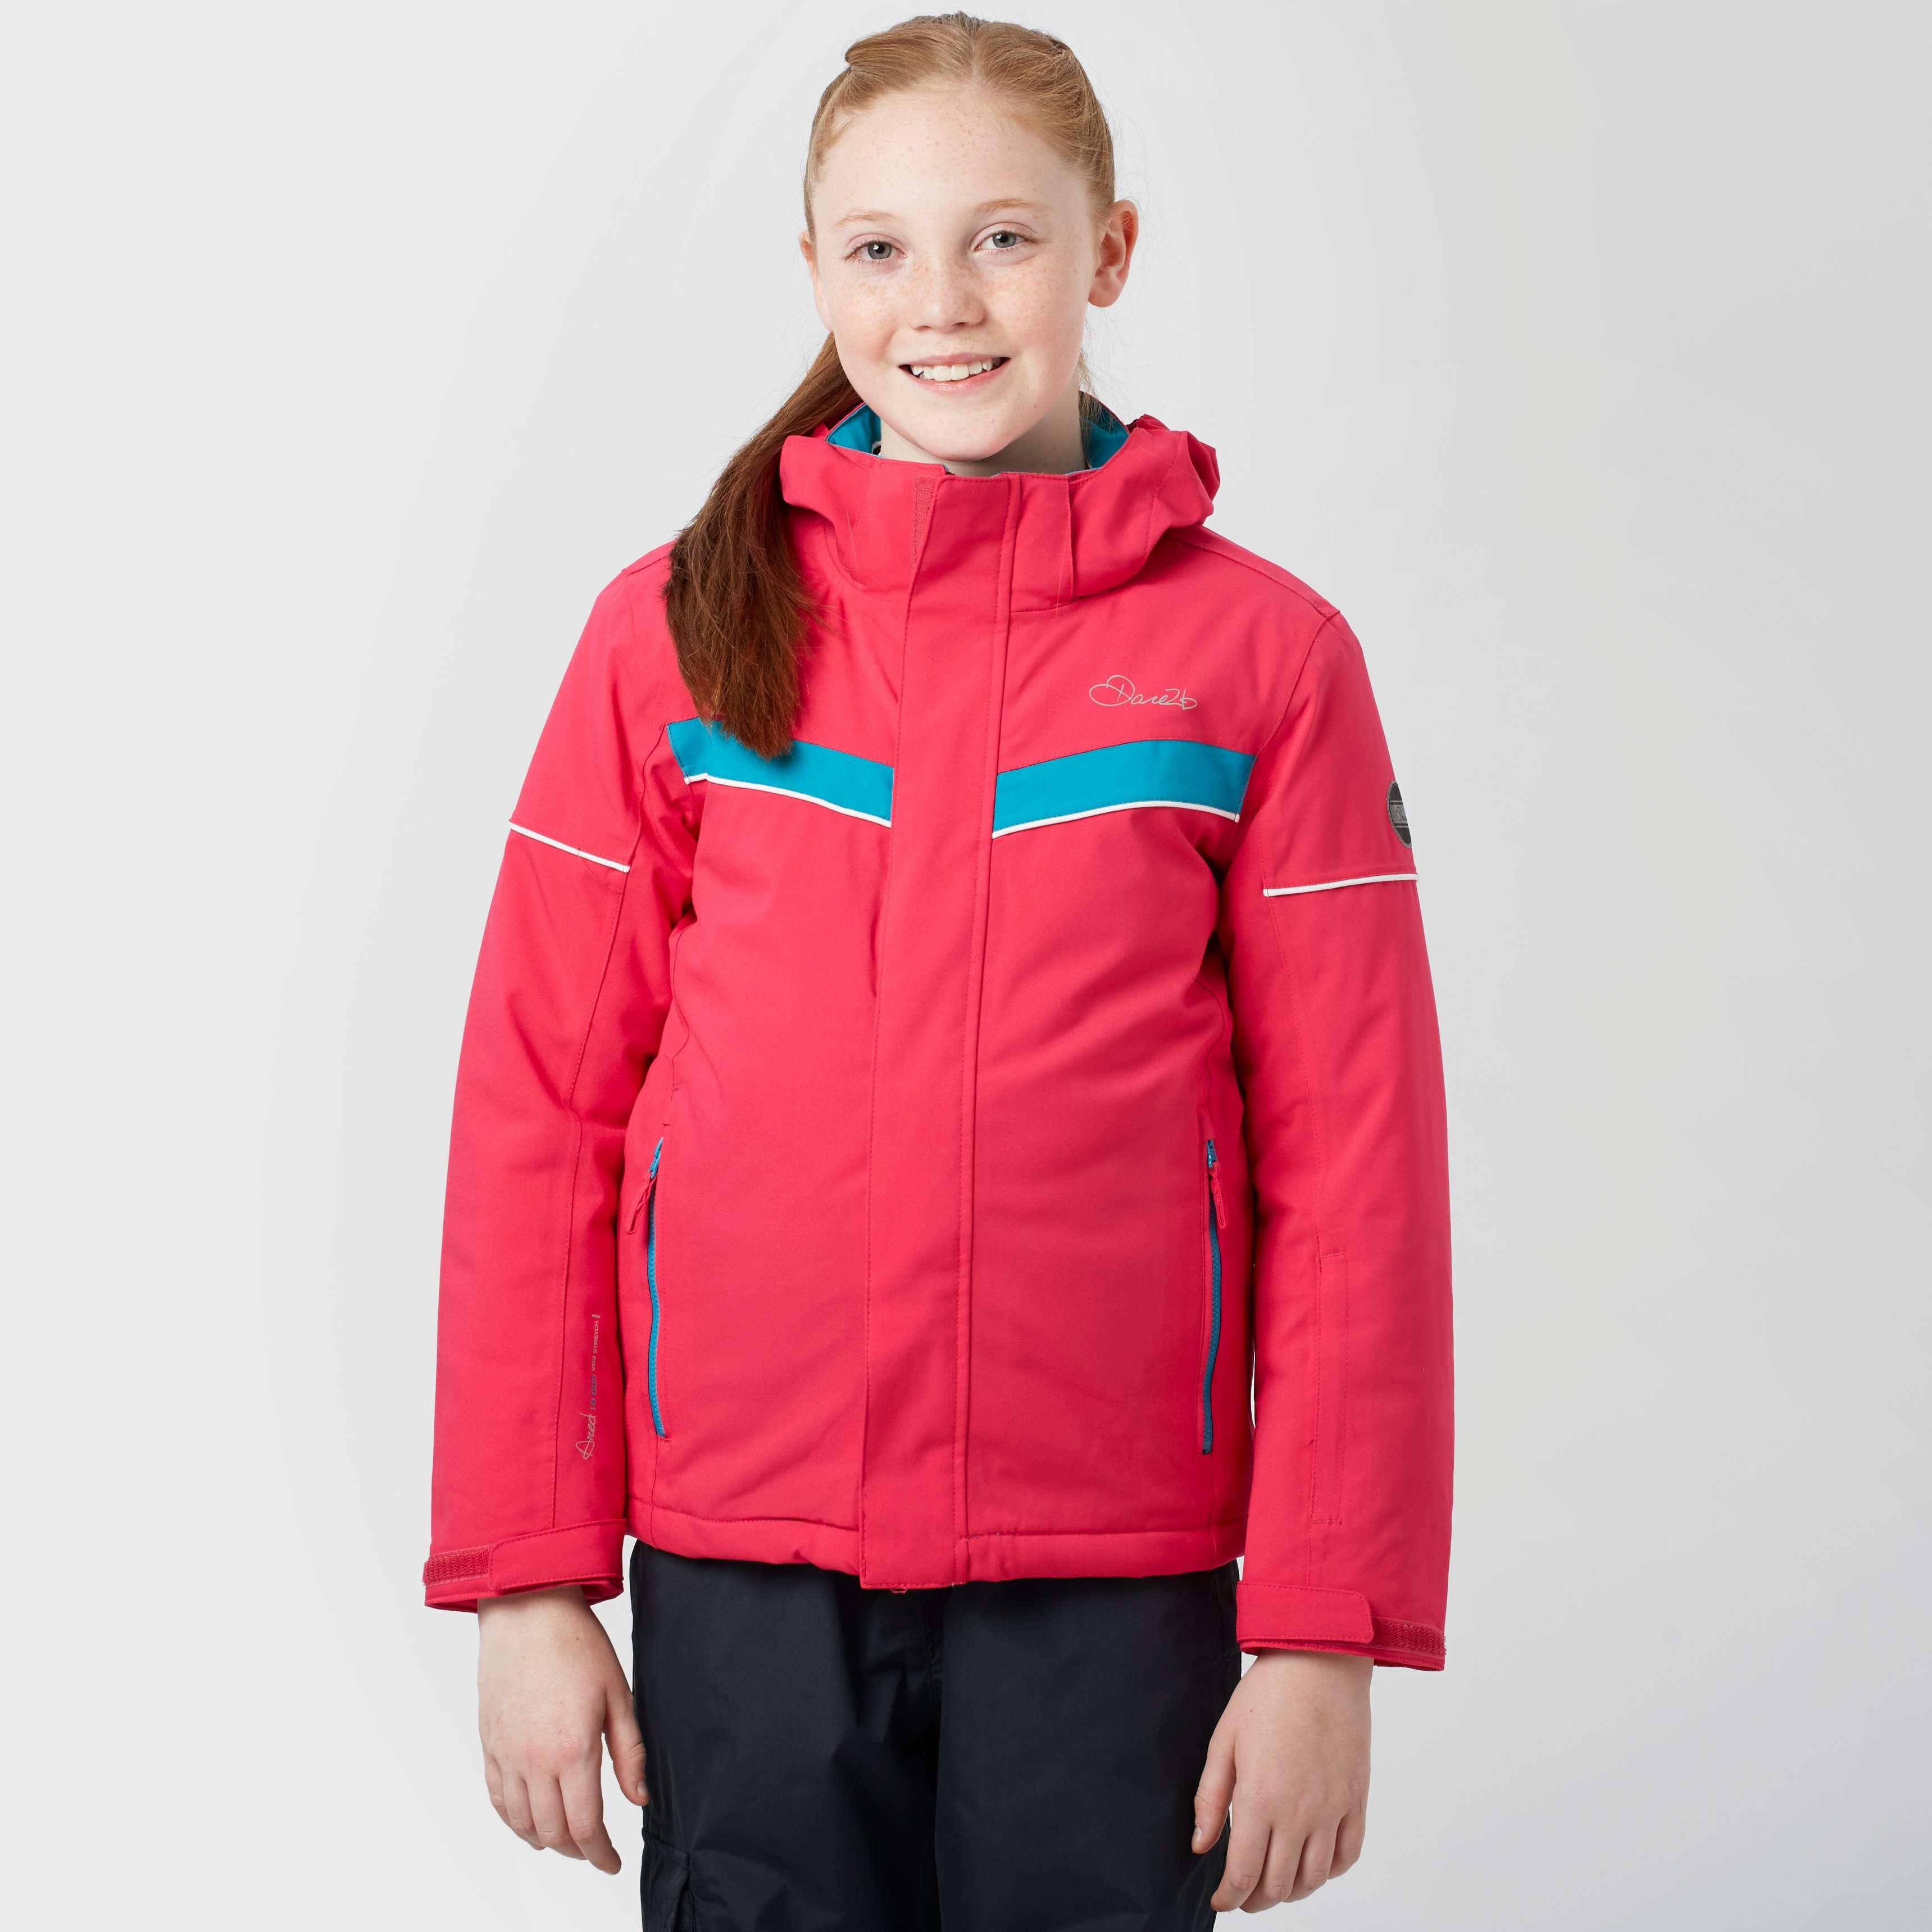 DARE 2B Girls Mentored Jacket